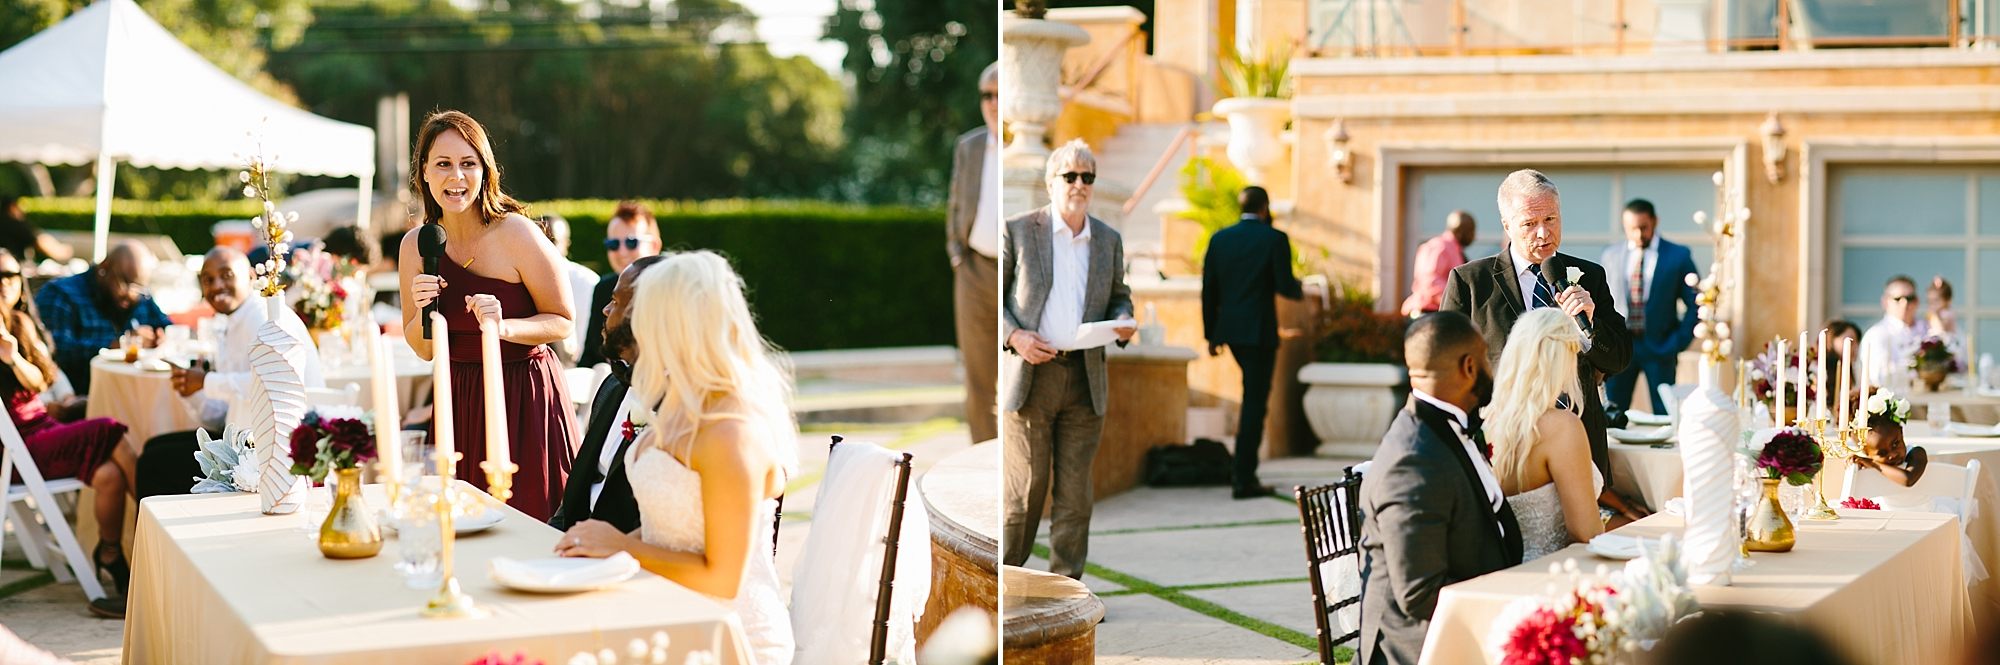 044 Los Angeles Wedding Photographer Malibu.jpg